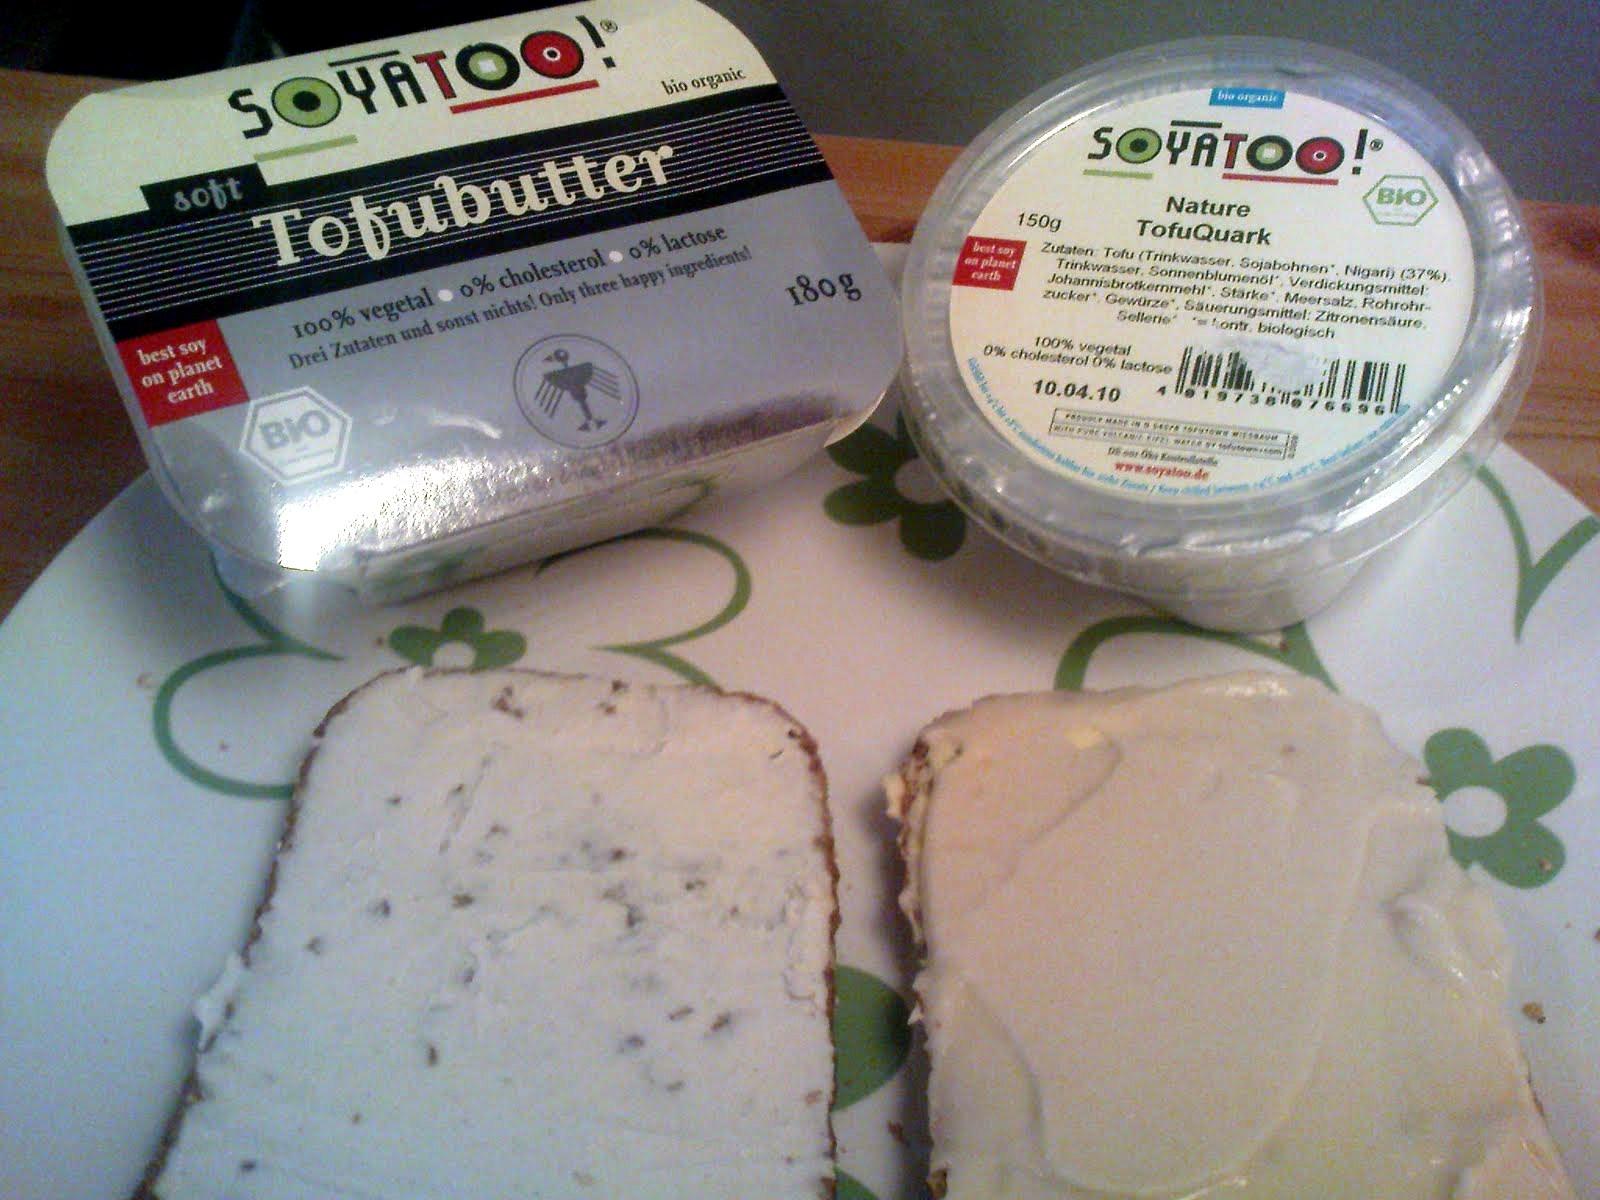 soyatoo tofuquark nature und tofubutter berfl ssig vegane rezepte auf laubfresser. Black Bedroom Furniture Sets. Home Design Ideas